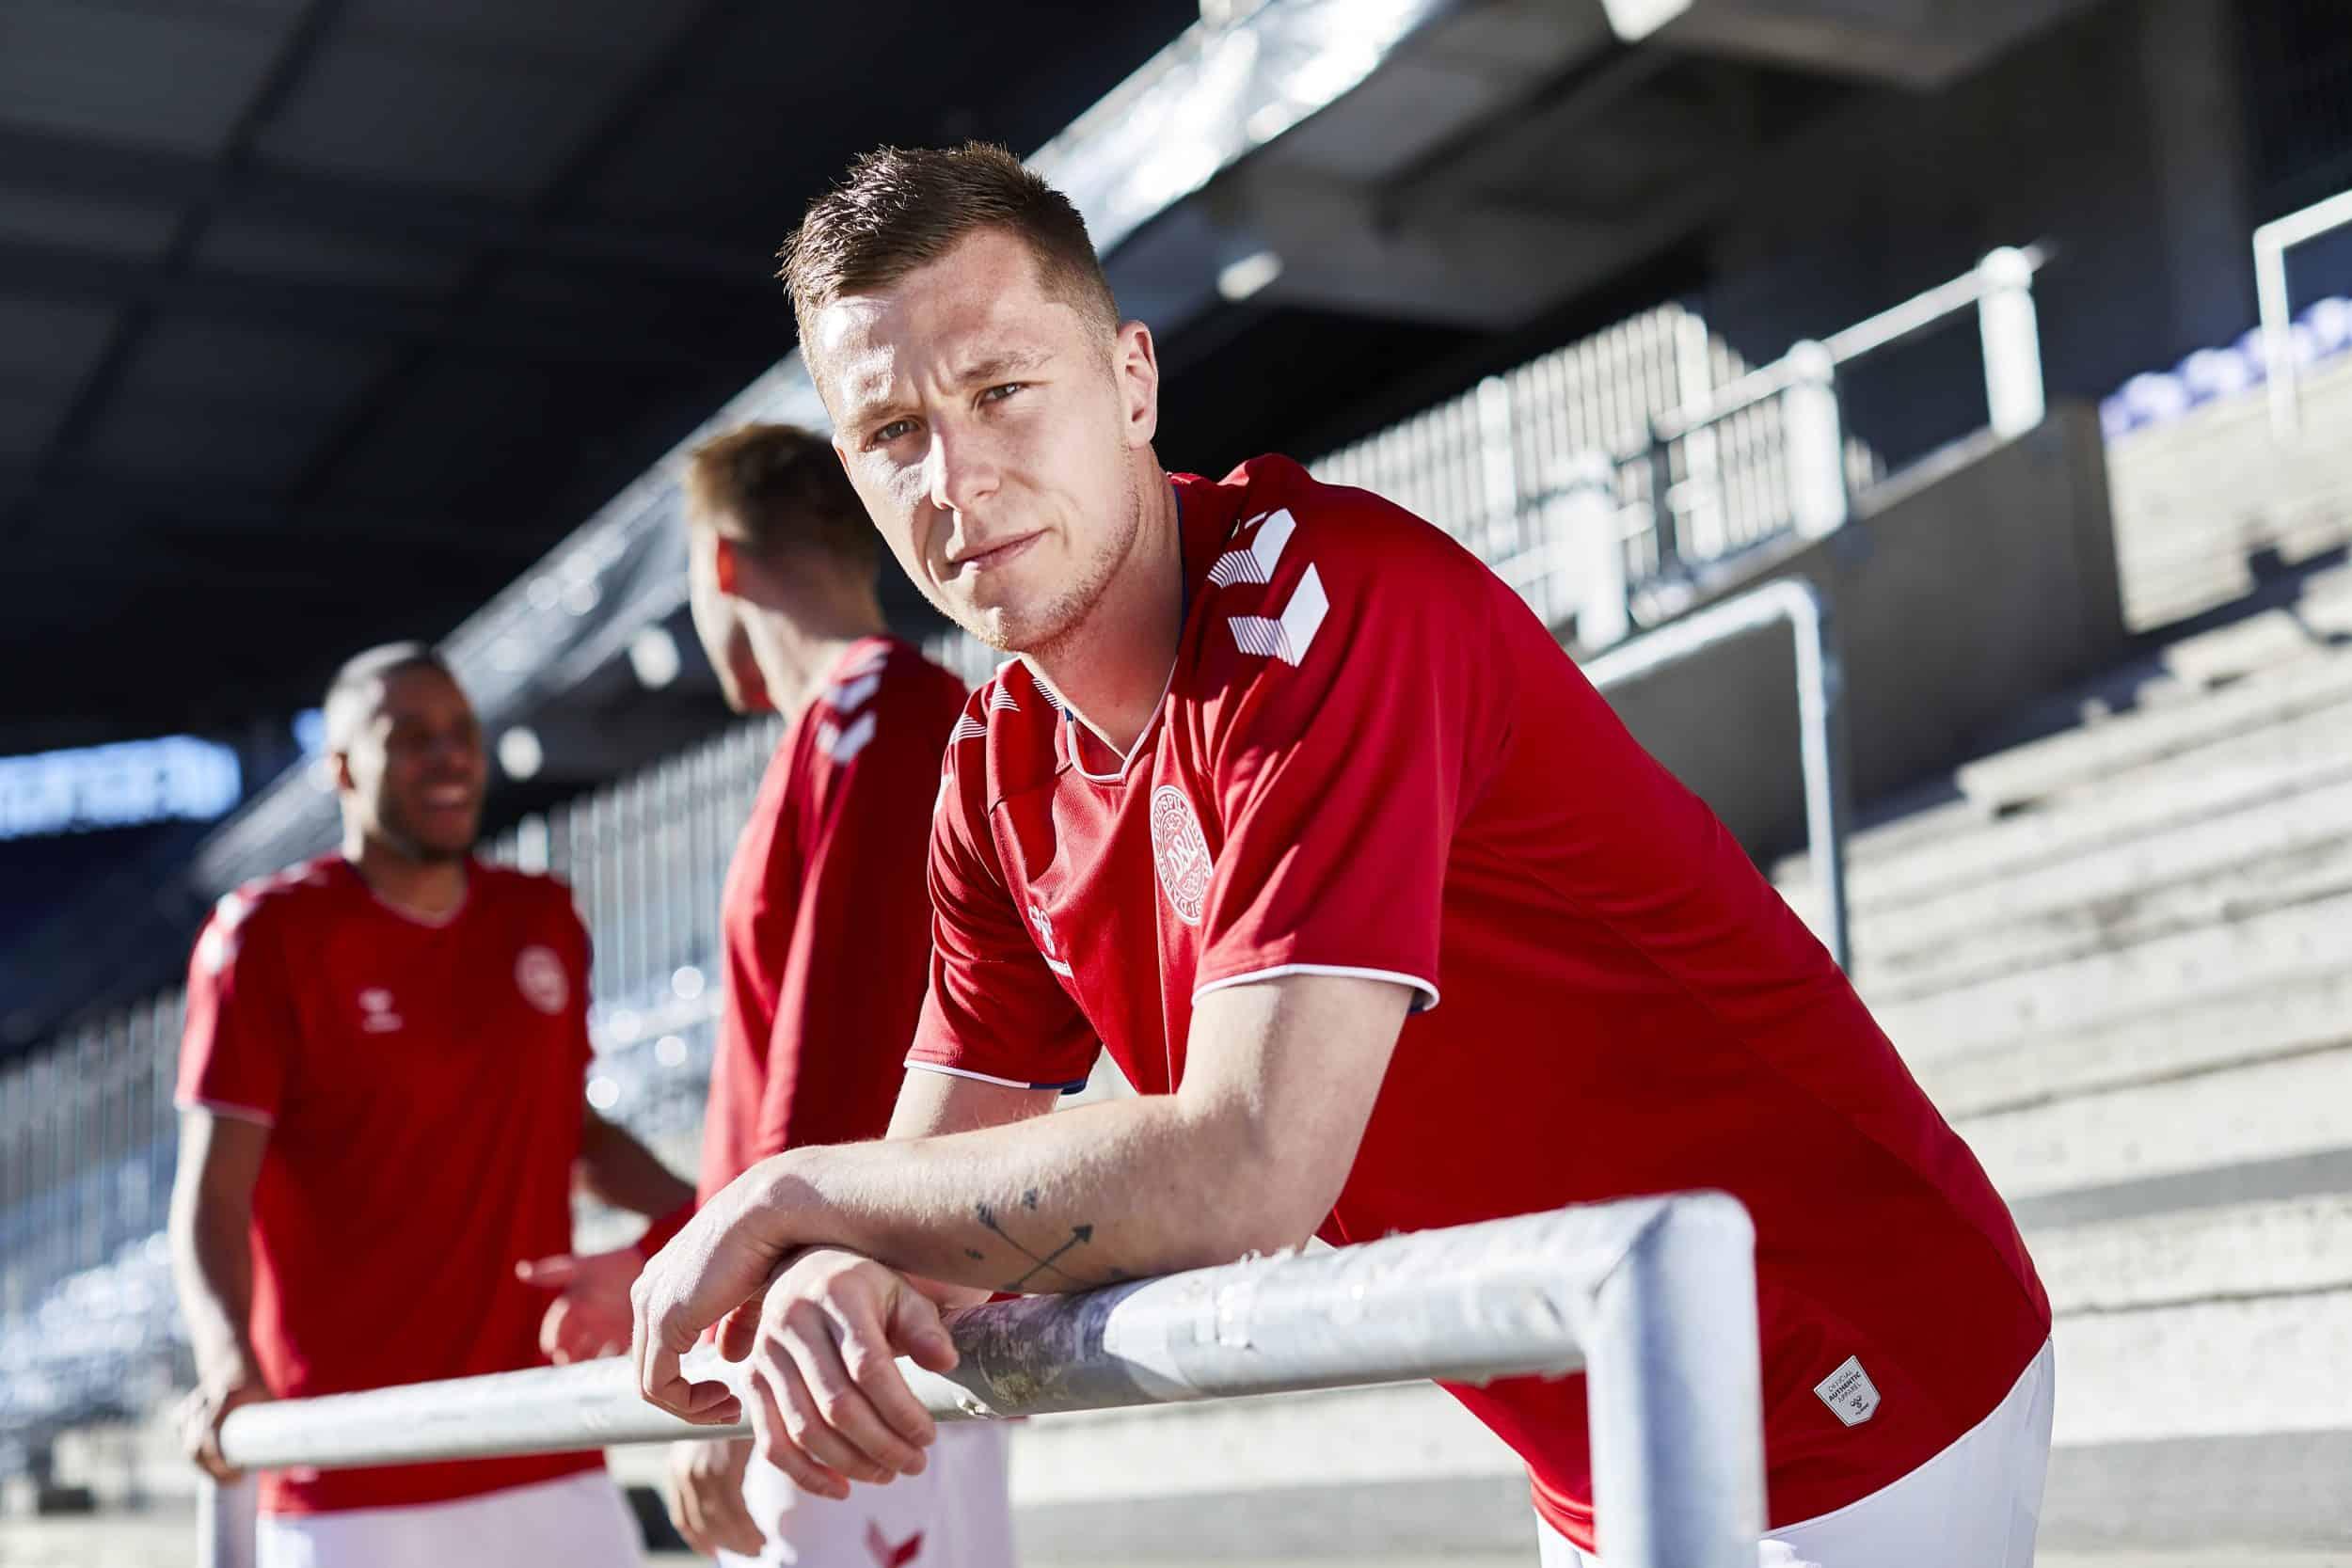 maillot-football-selection-danemark-coupe-du-monde-2018-2